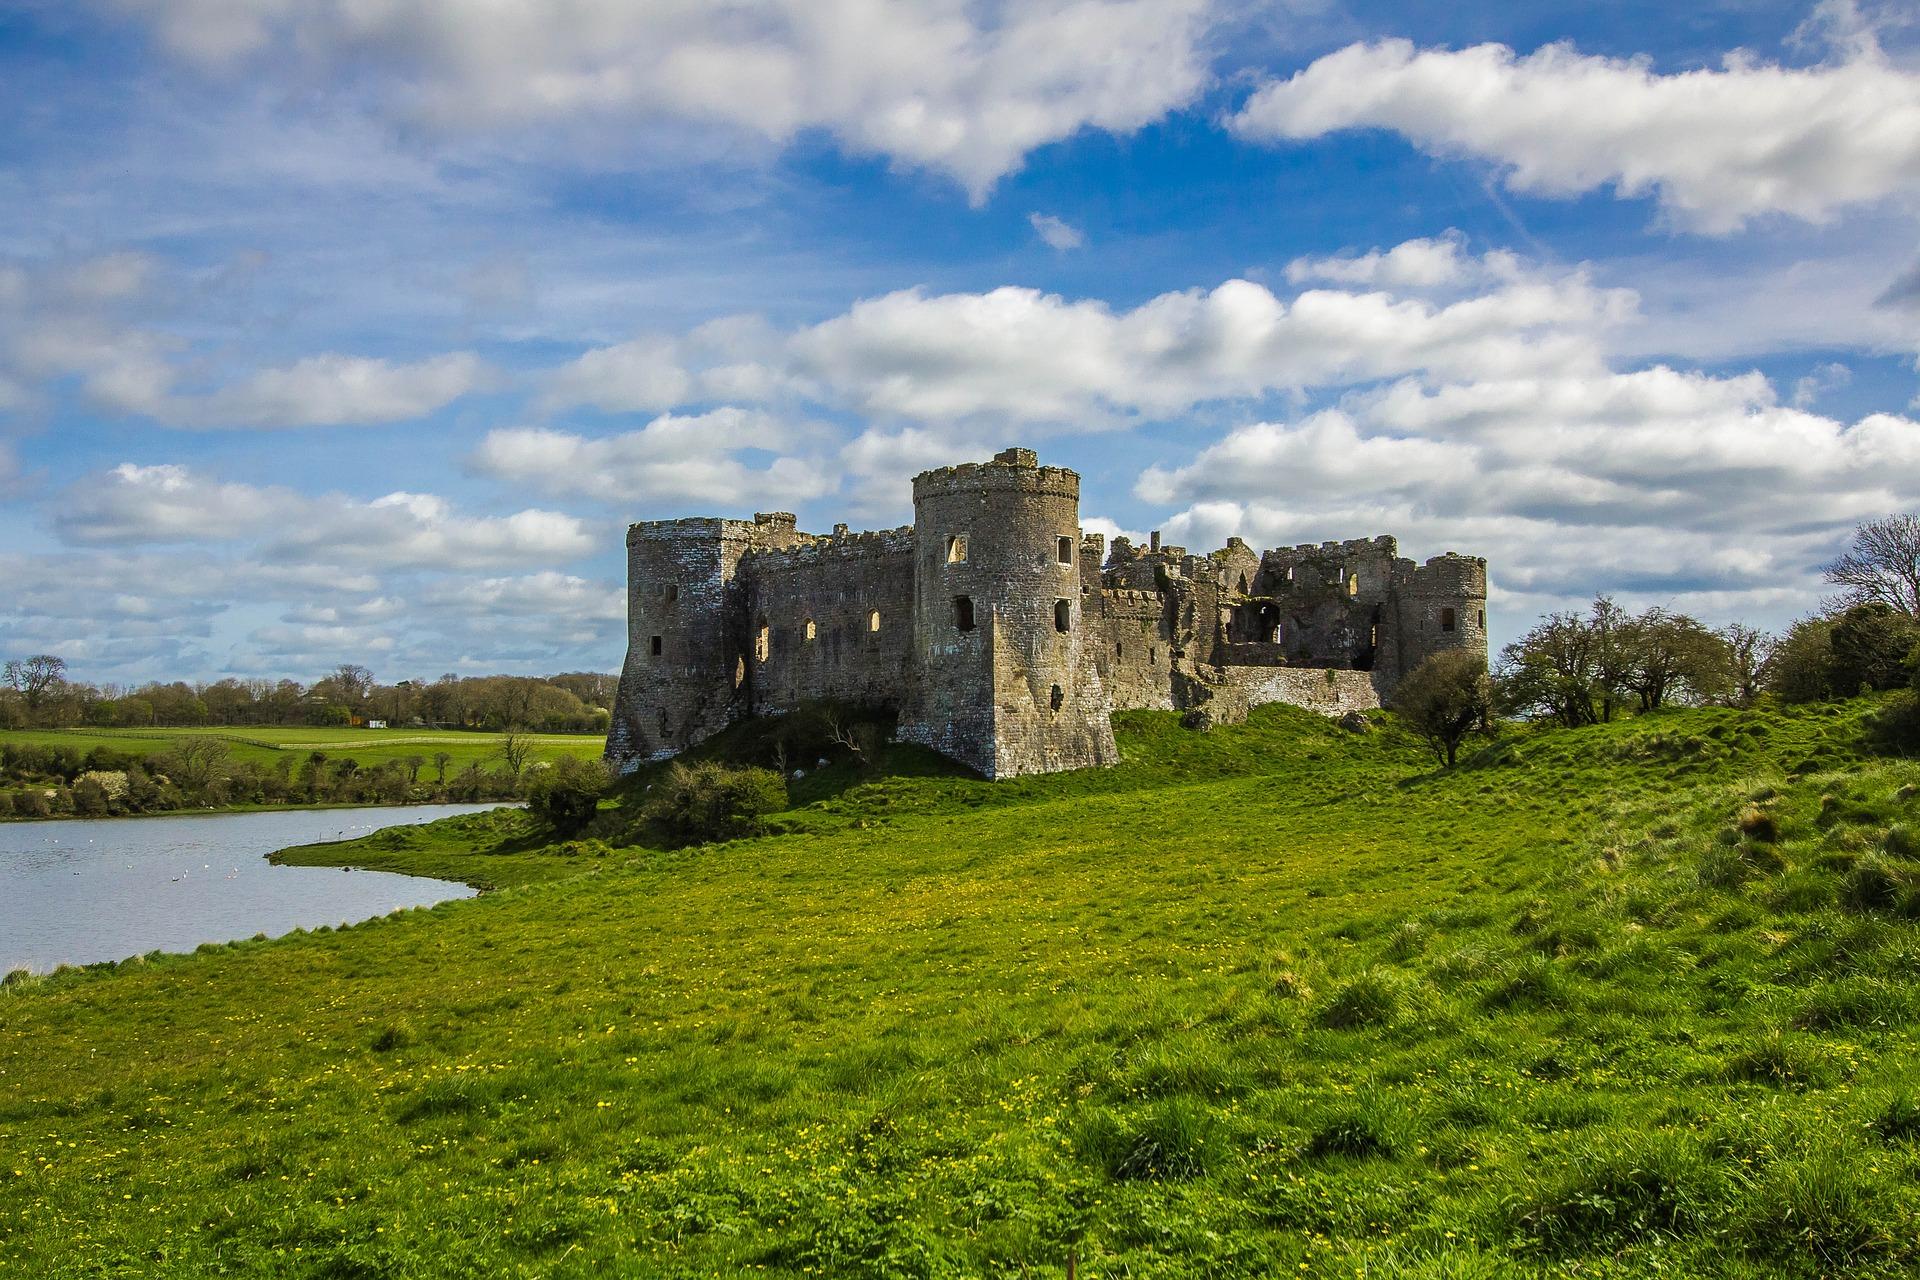 carew-castle-2305685_1920.jpg